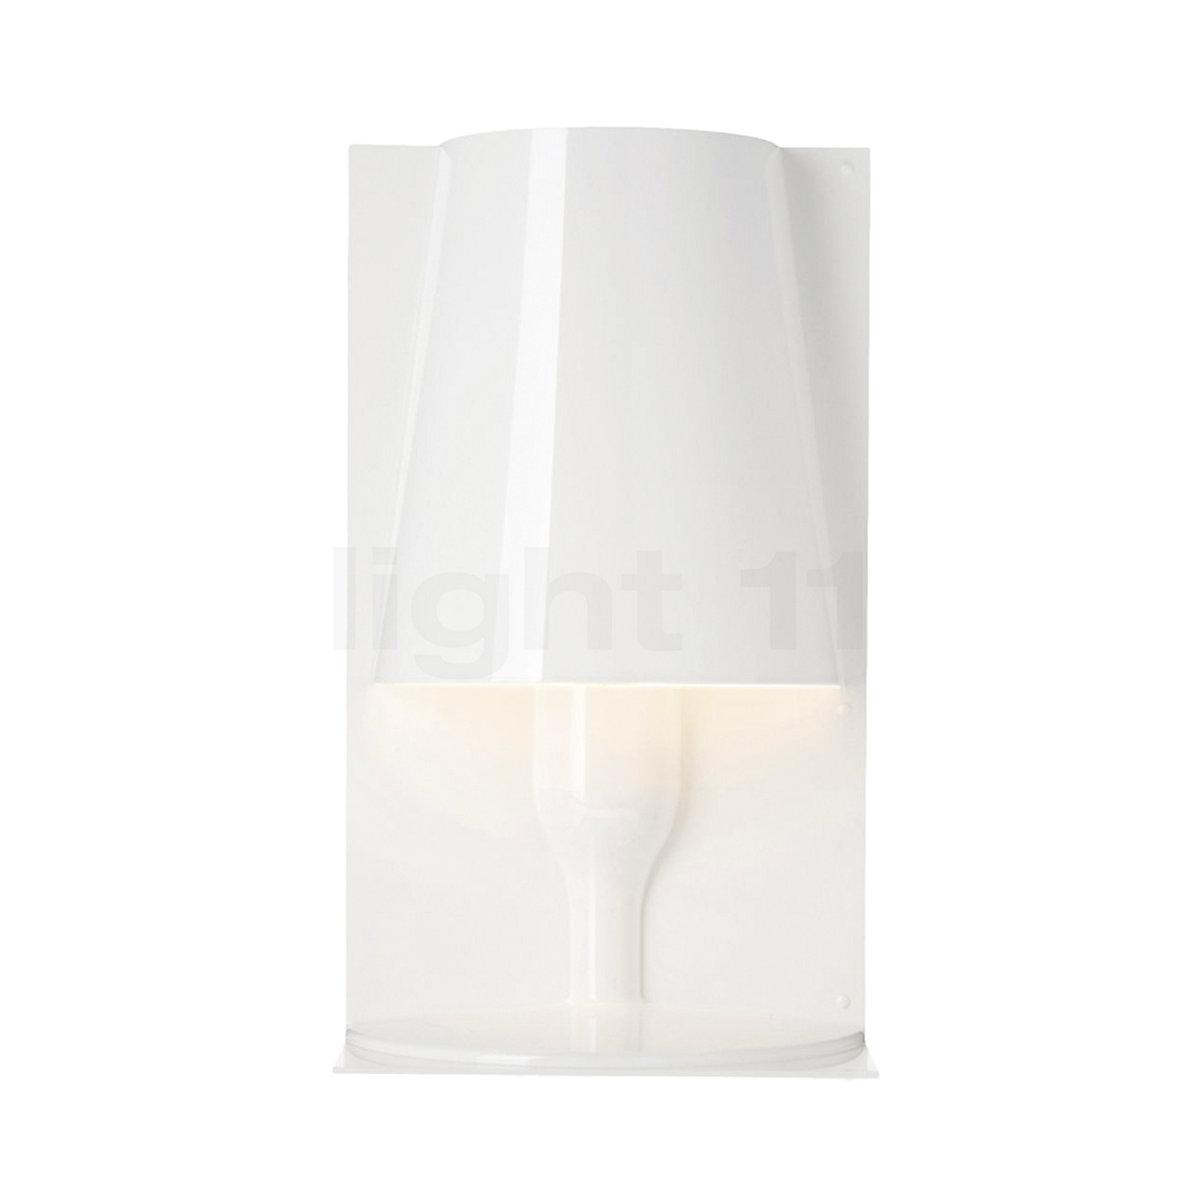 Kartell Take Lampada Da Tavolo Light11 It